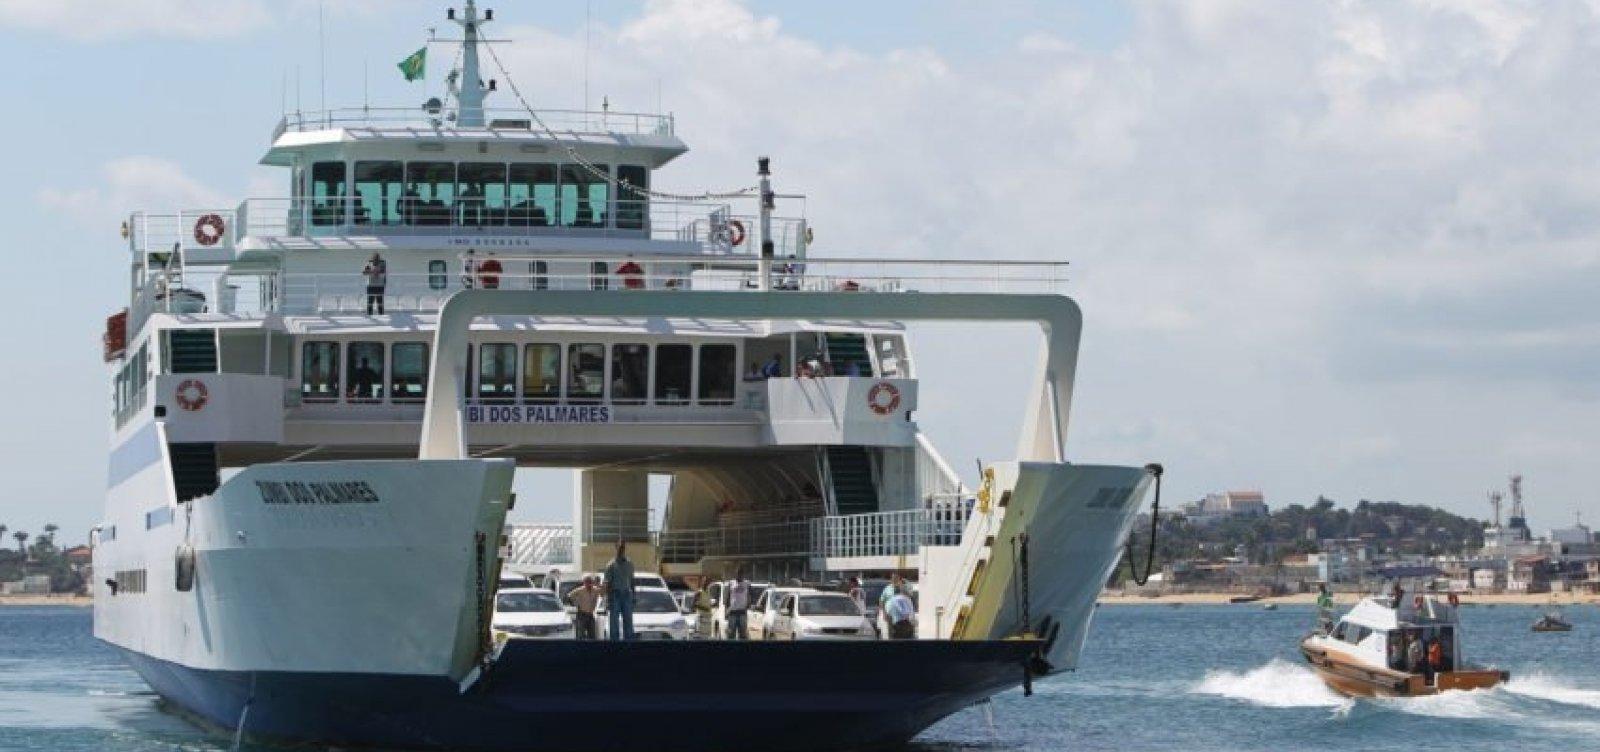 Ferry-boat registra fluxo tranquilo na tarde deste domingo